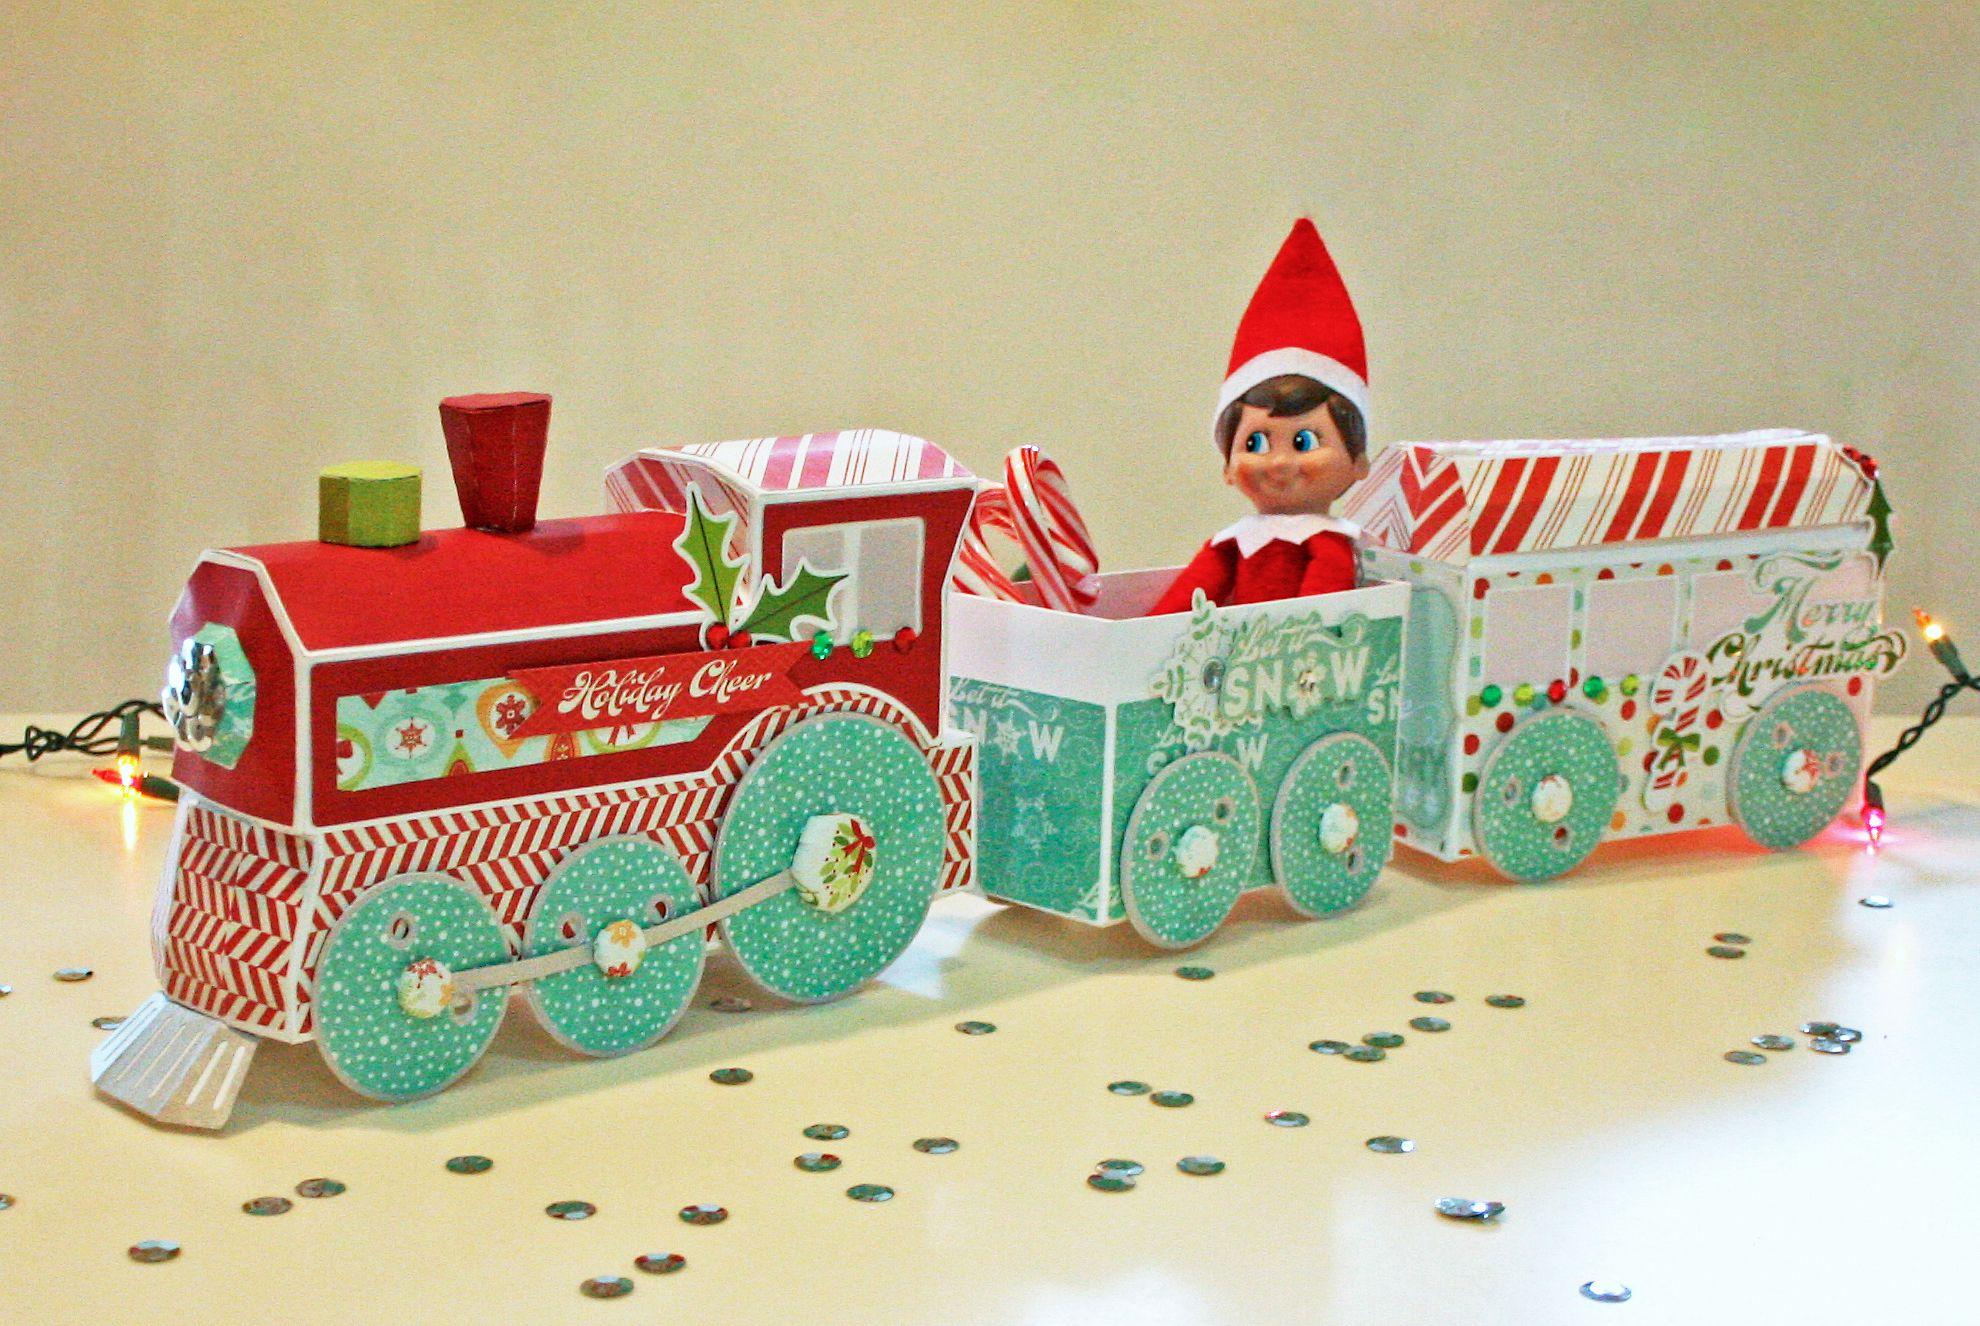 Holiday Express Xmas elf, Christmas elf